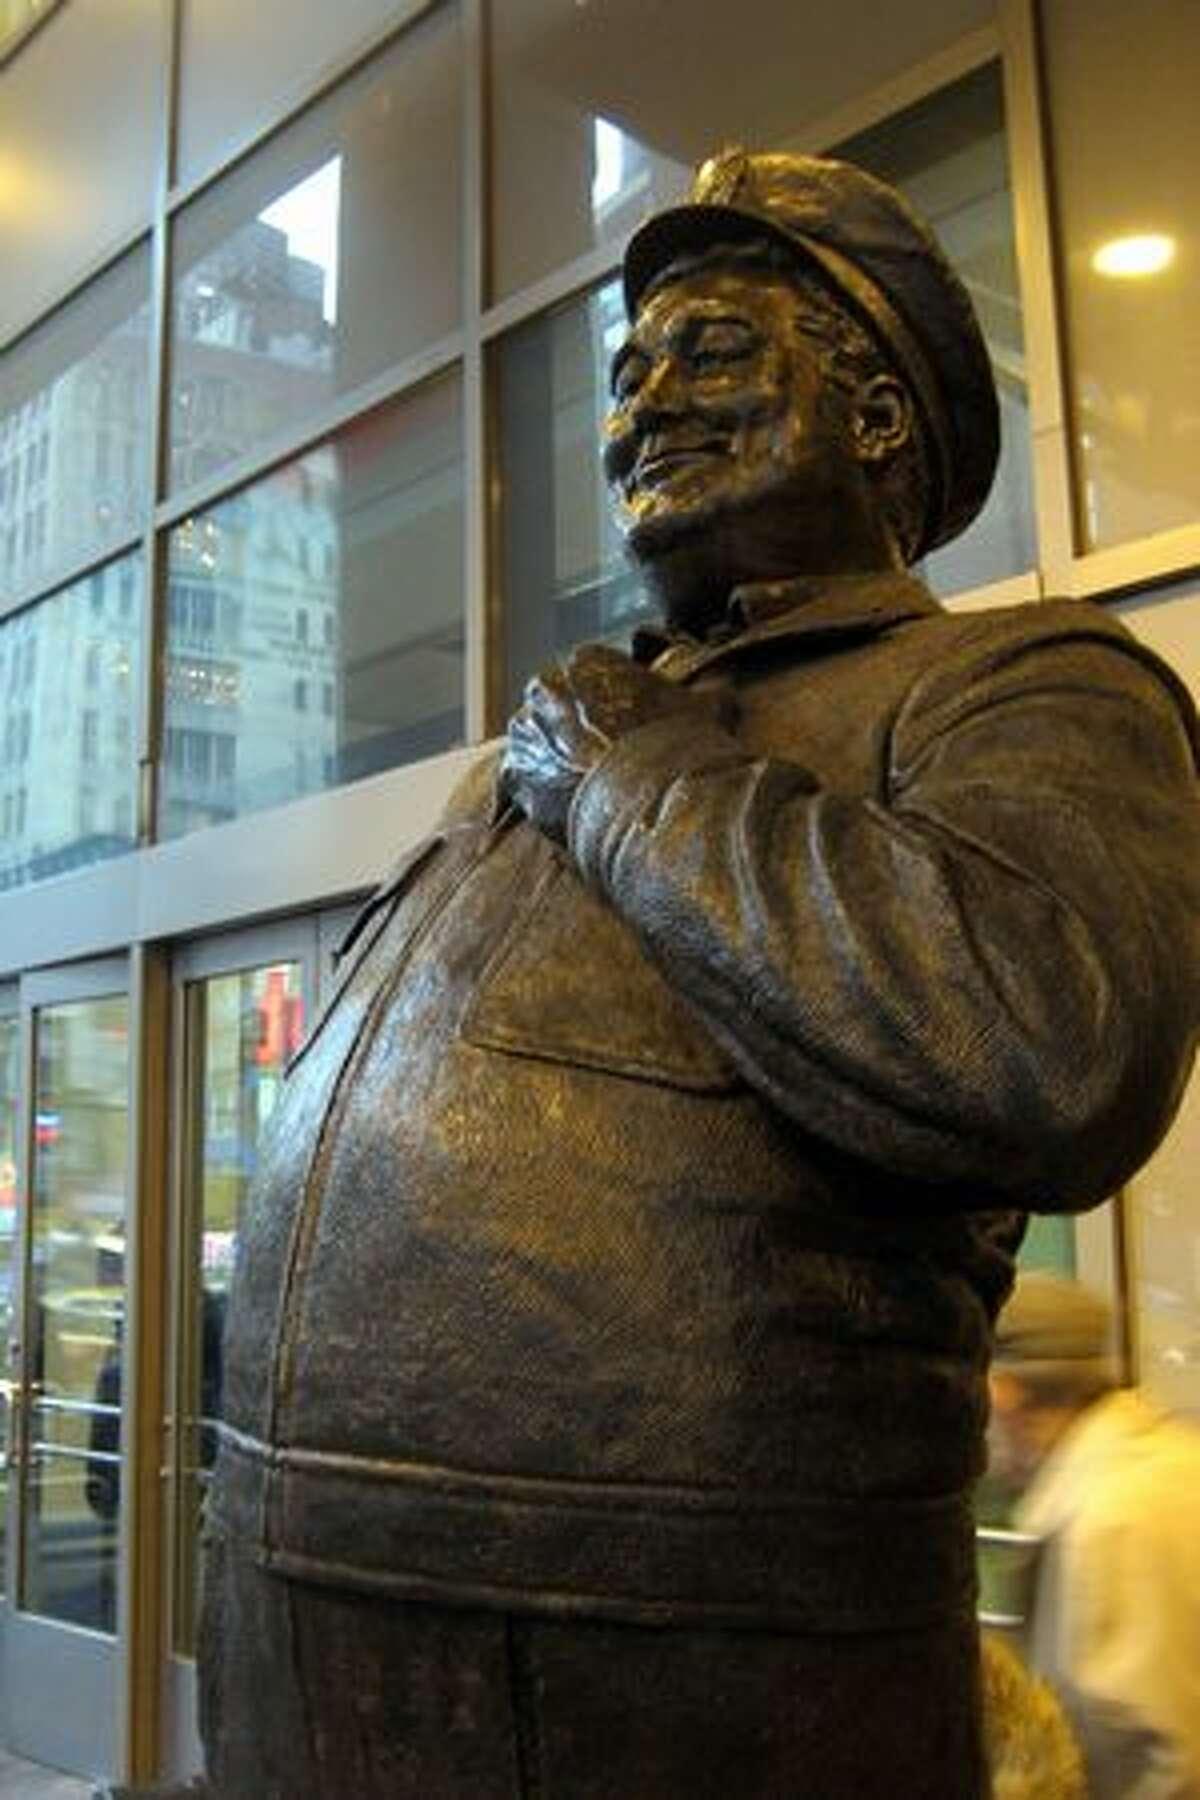 Statue of Ralph Cramden, from